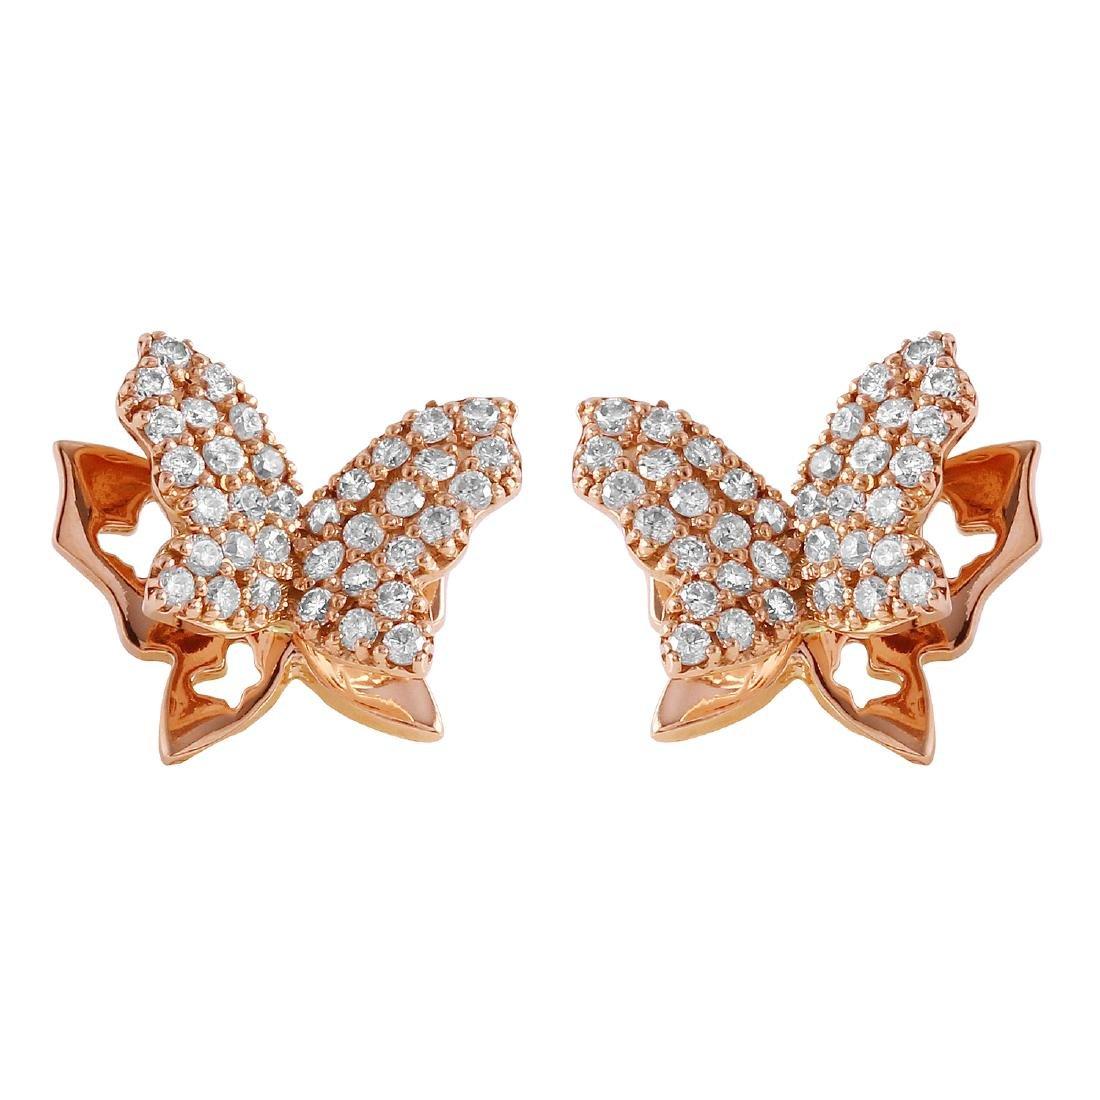 0.48 Carat Natural Diamond 18K Solid Rose Gold Earring